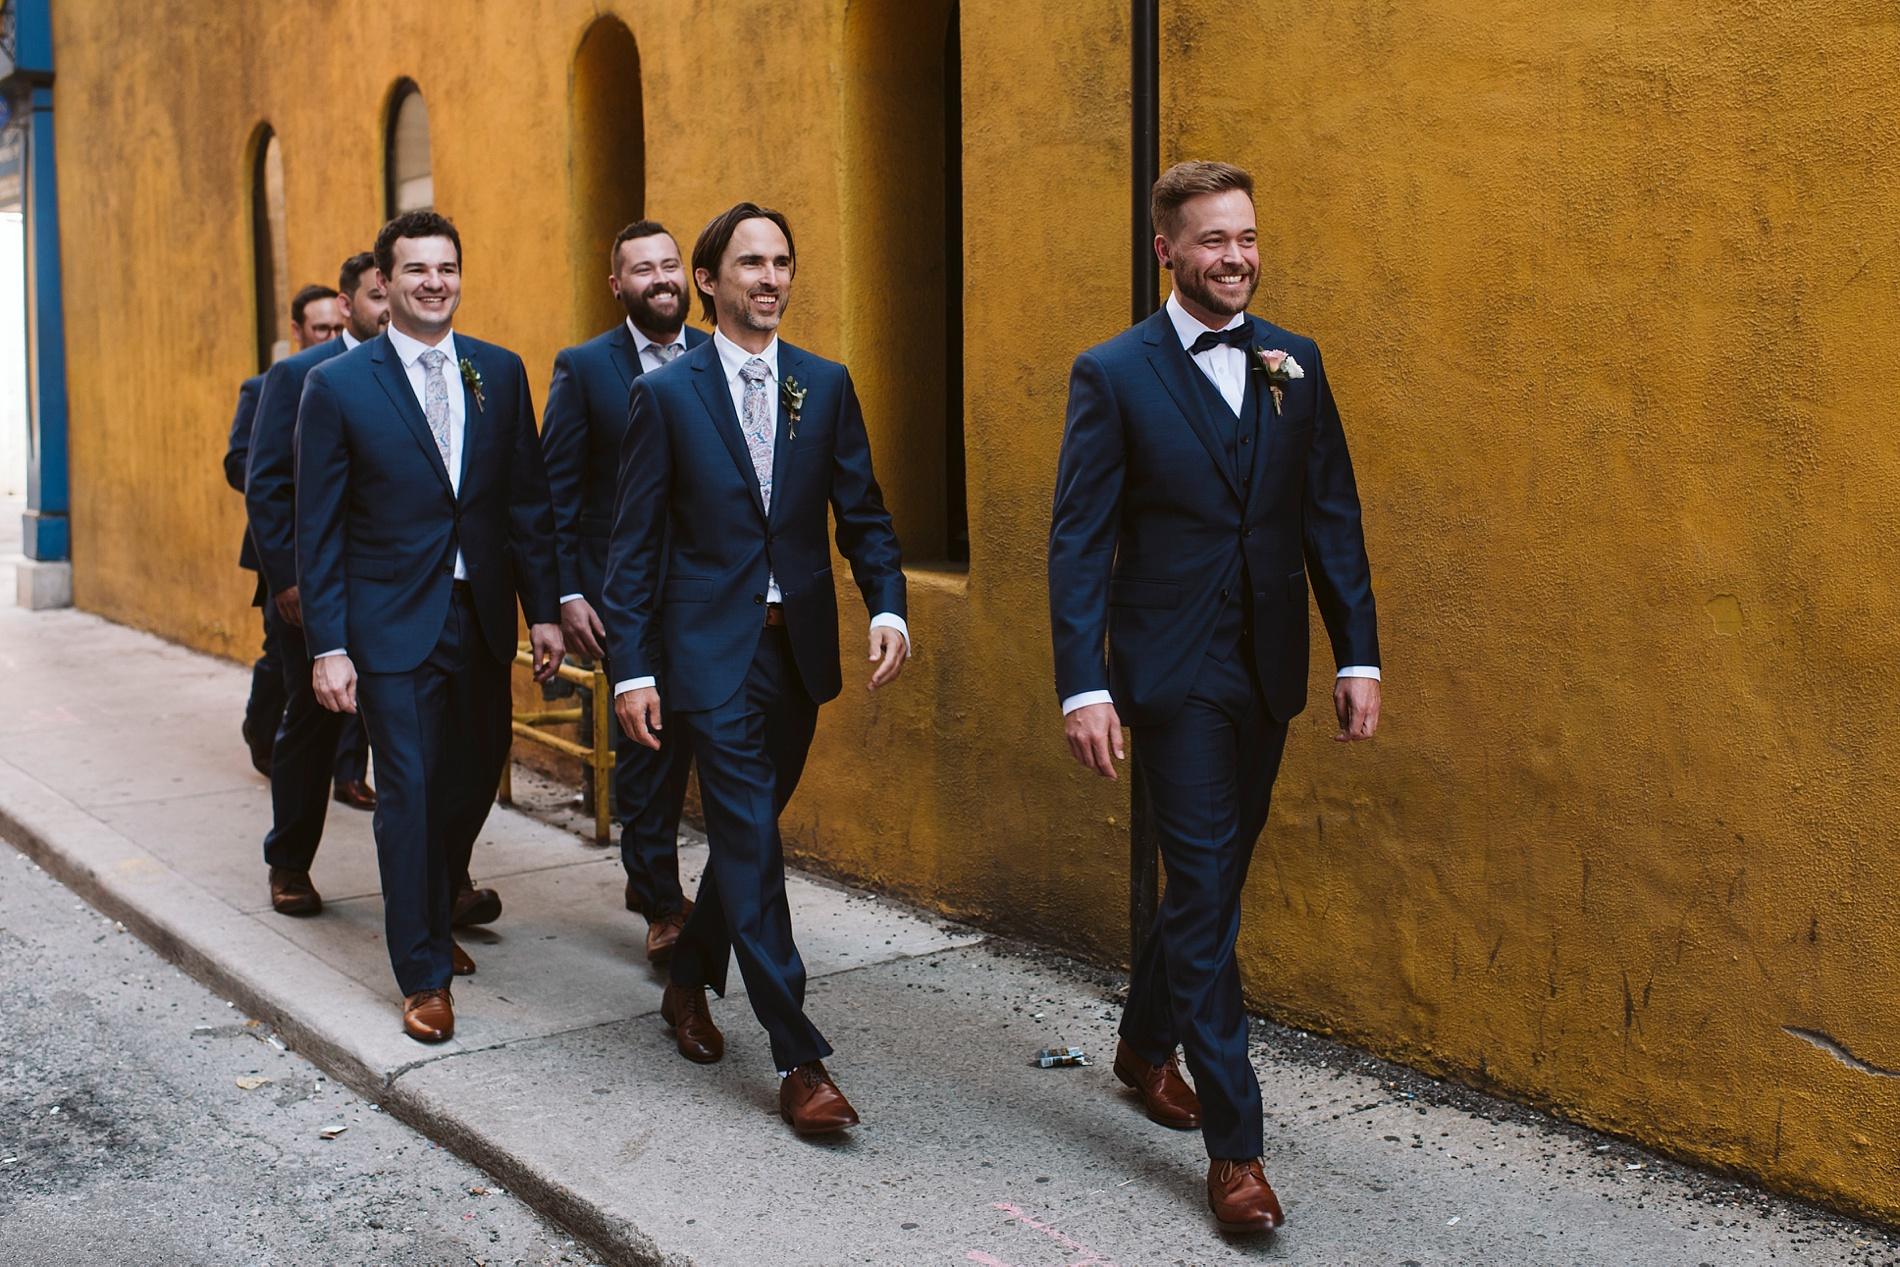 Toronto_Wedding_Photographer_Albany_Club_0029.jpg